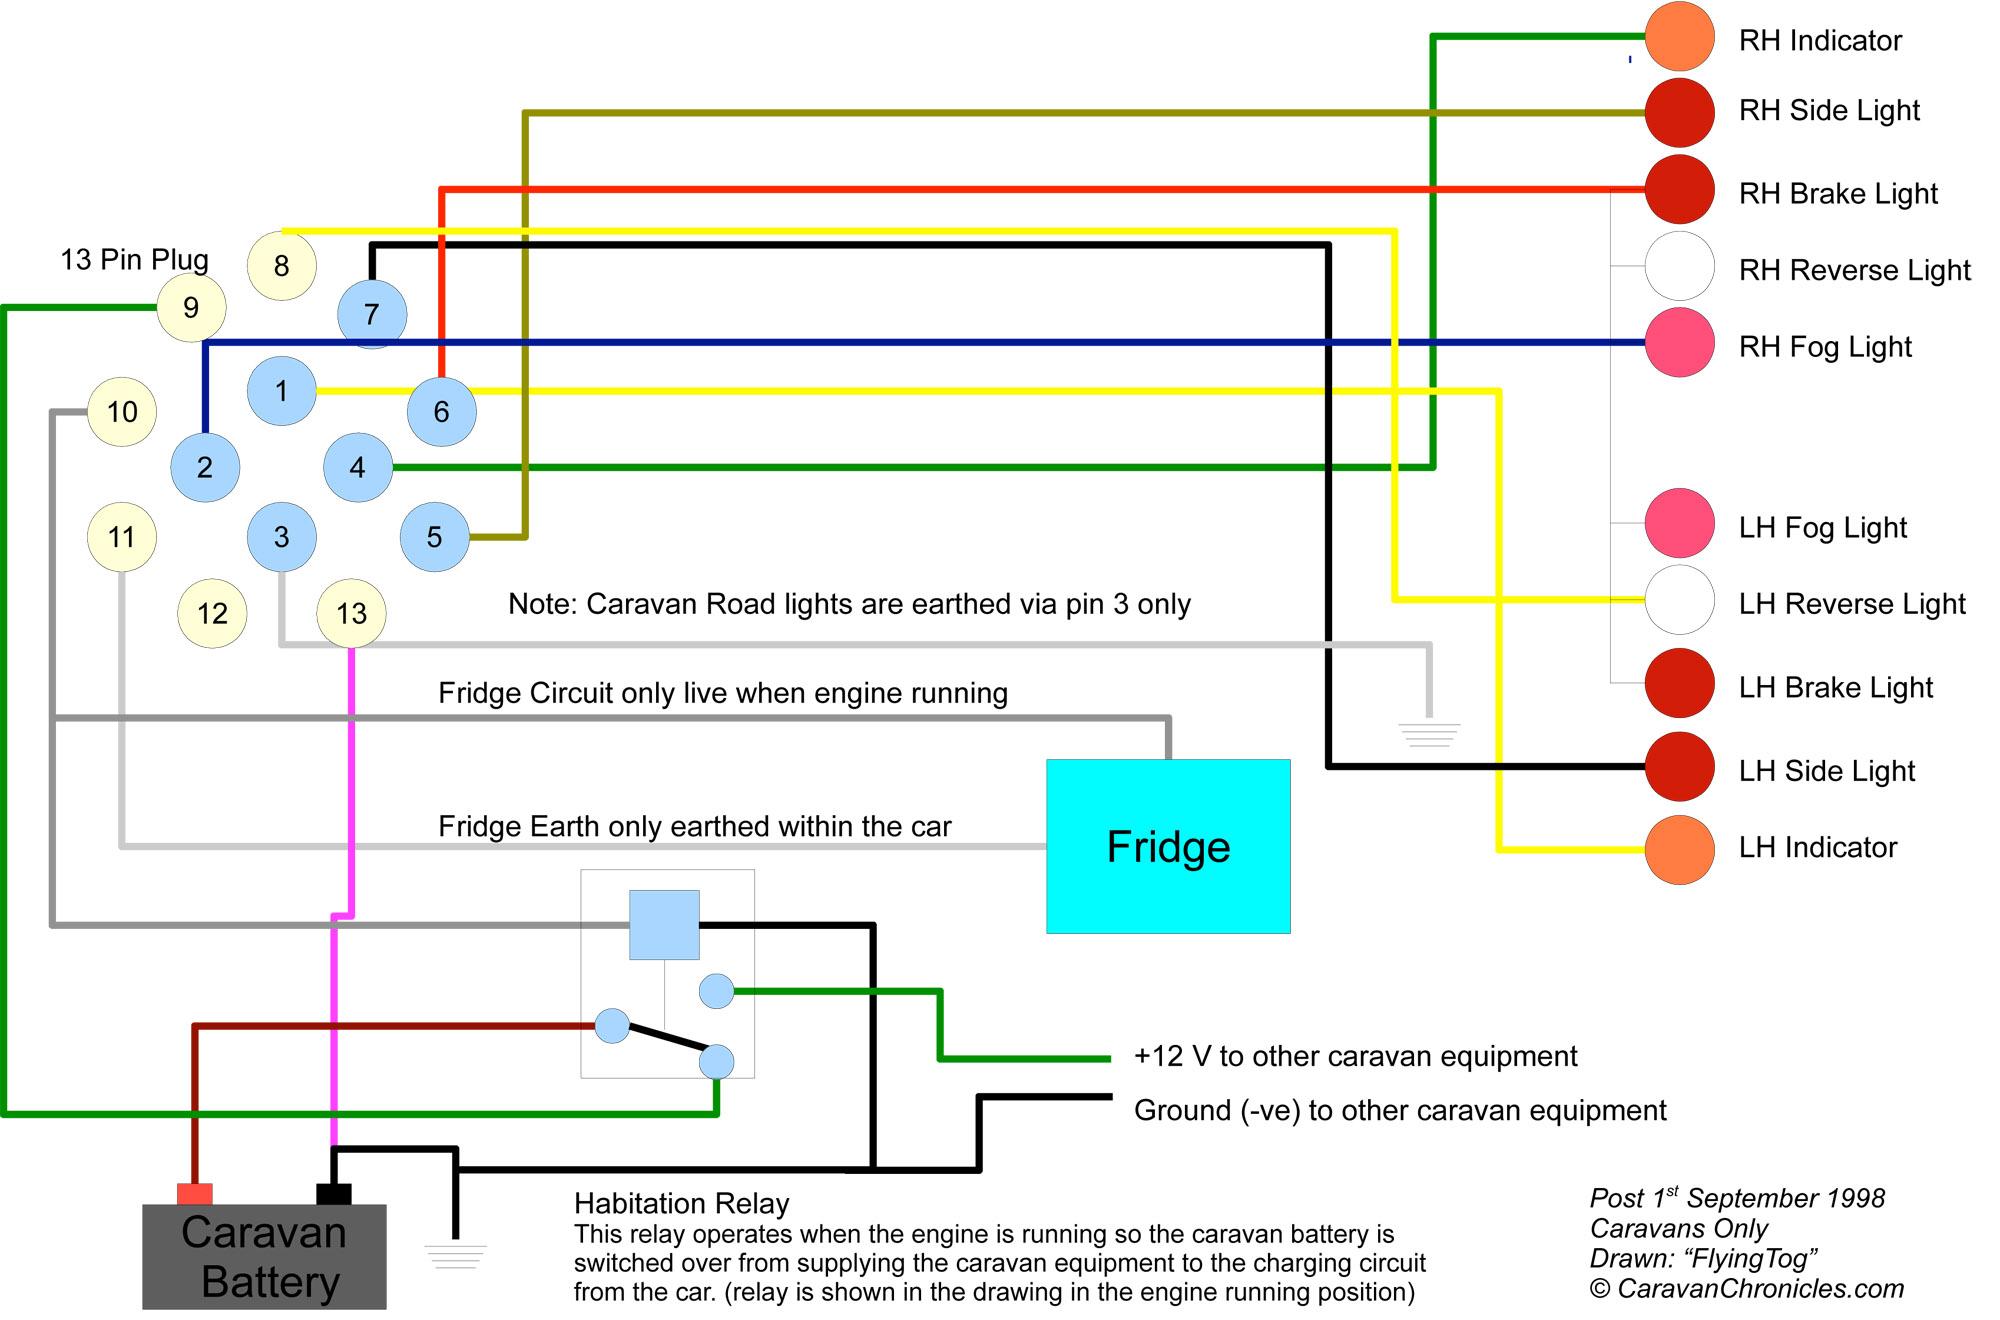 medium resolution of car indicator wiring diagram